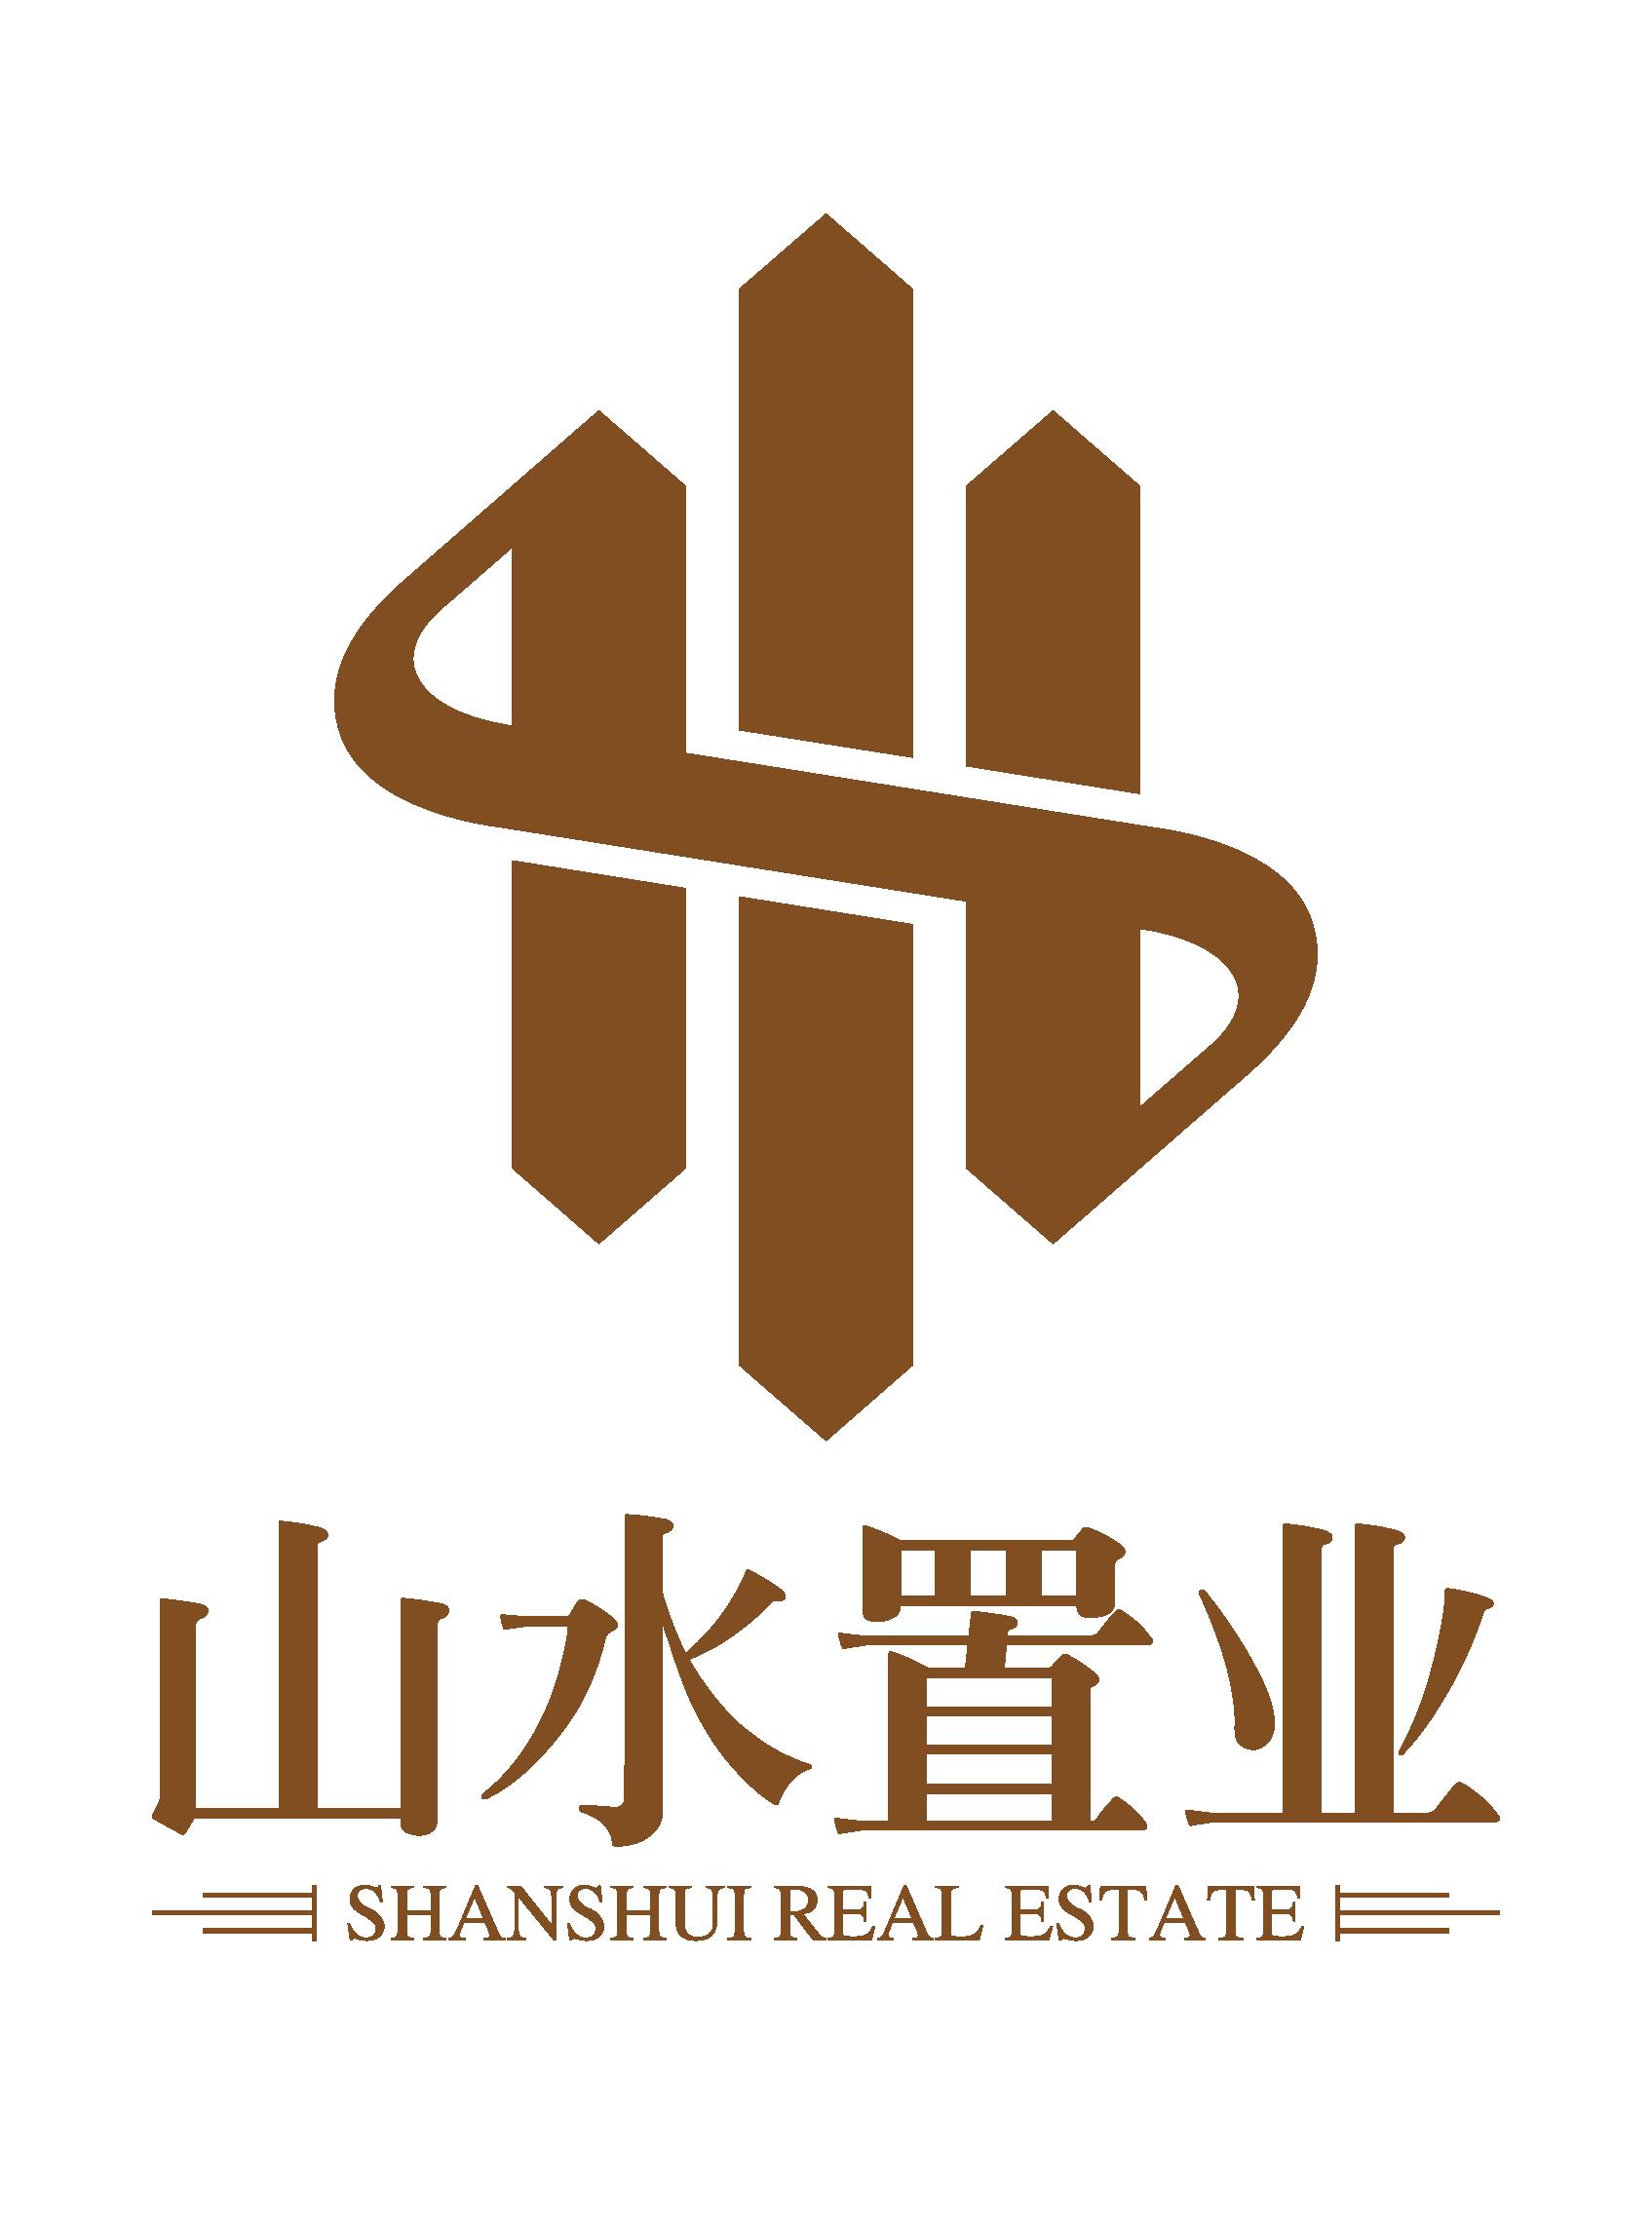 logo logo 标志 设计 矢量 矢量图 素材 图标 1695_2287 竖版 竖屏